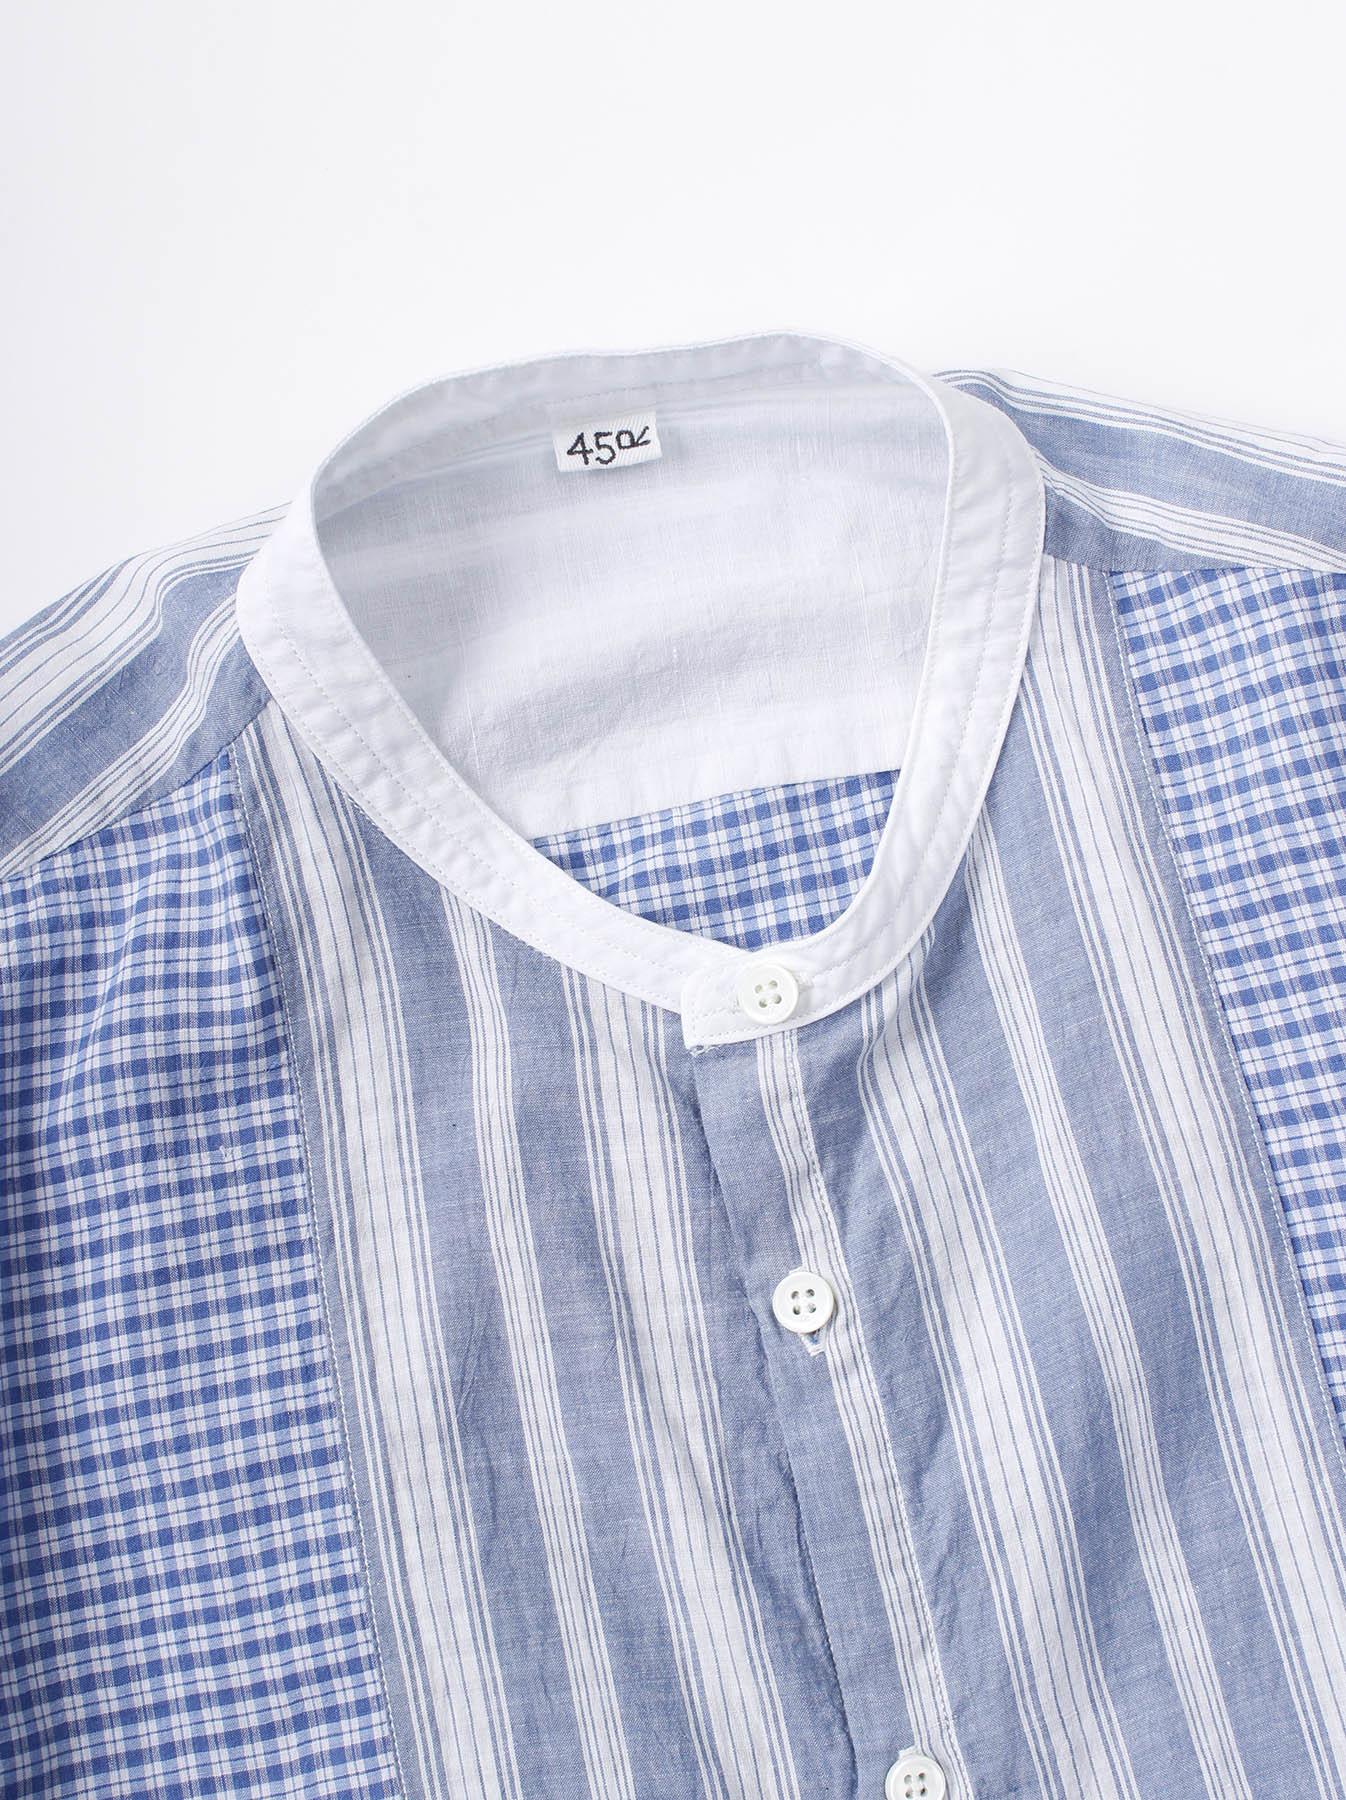 WH Mix Ai-kaze Khadi Pullover Shirt-2